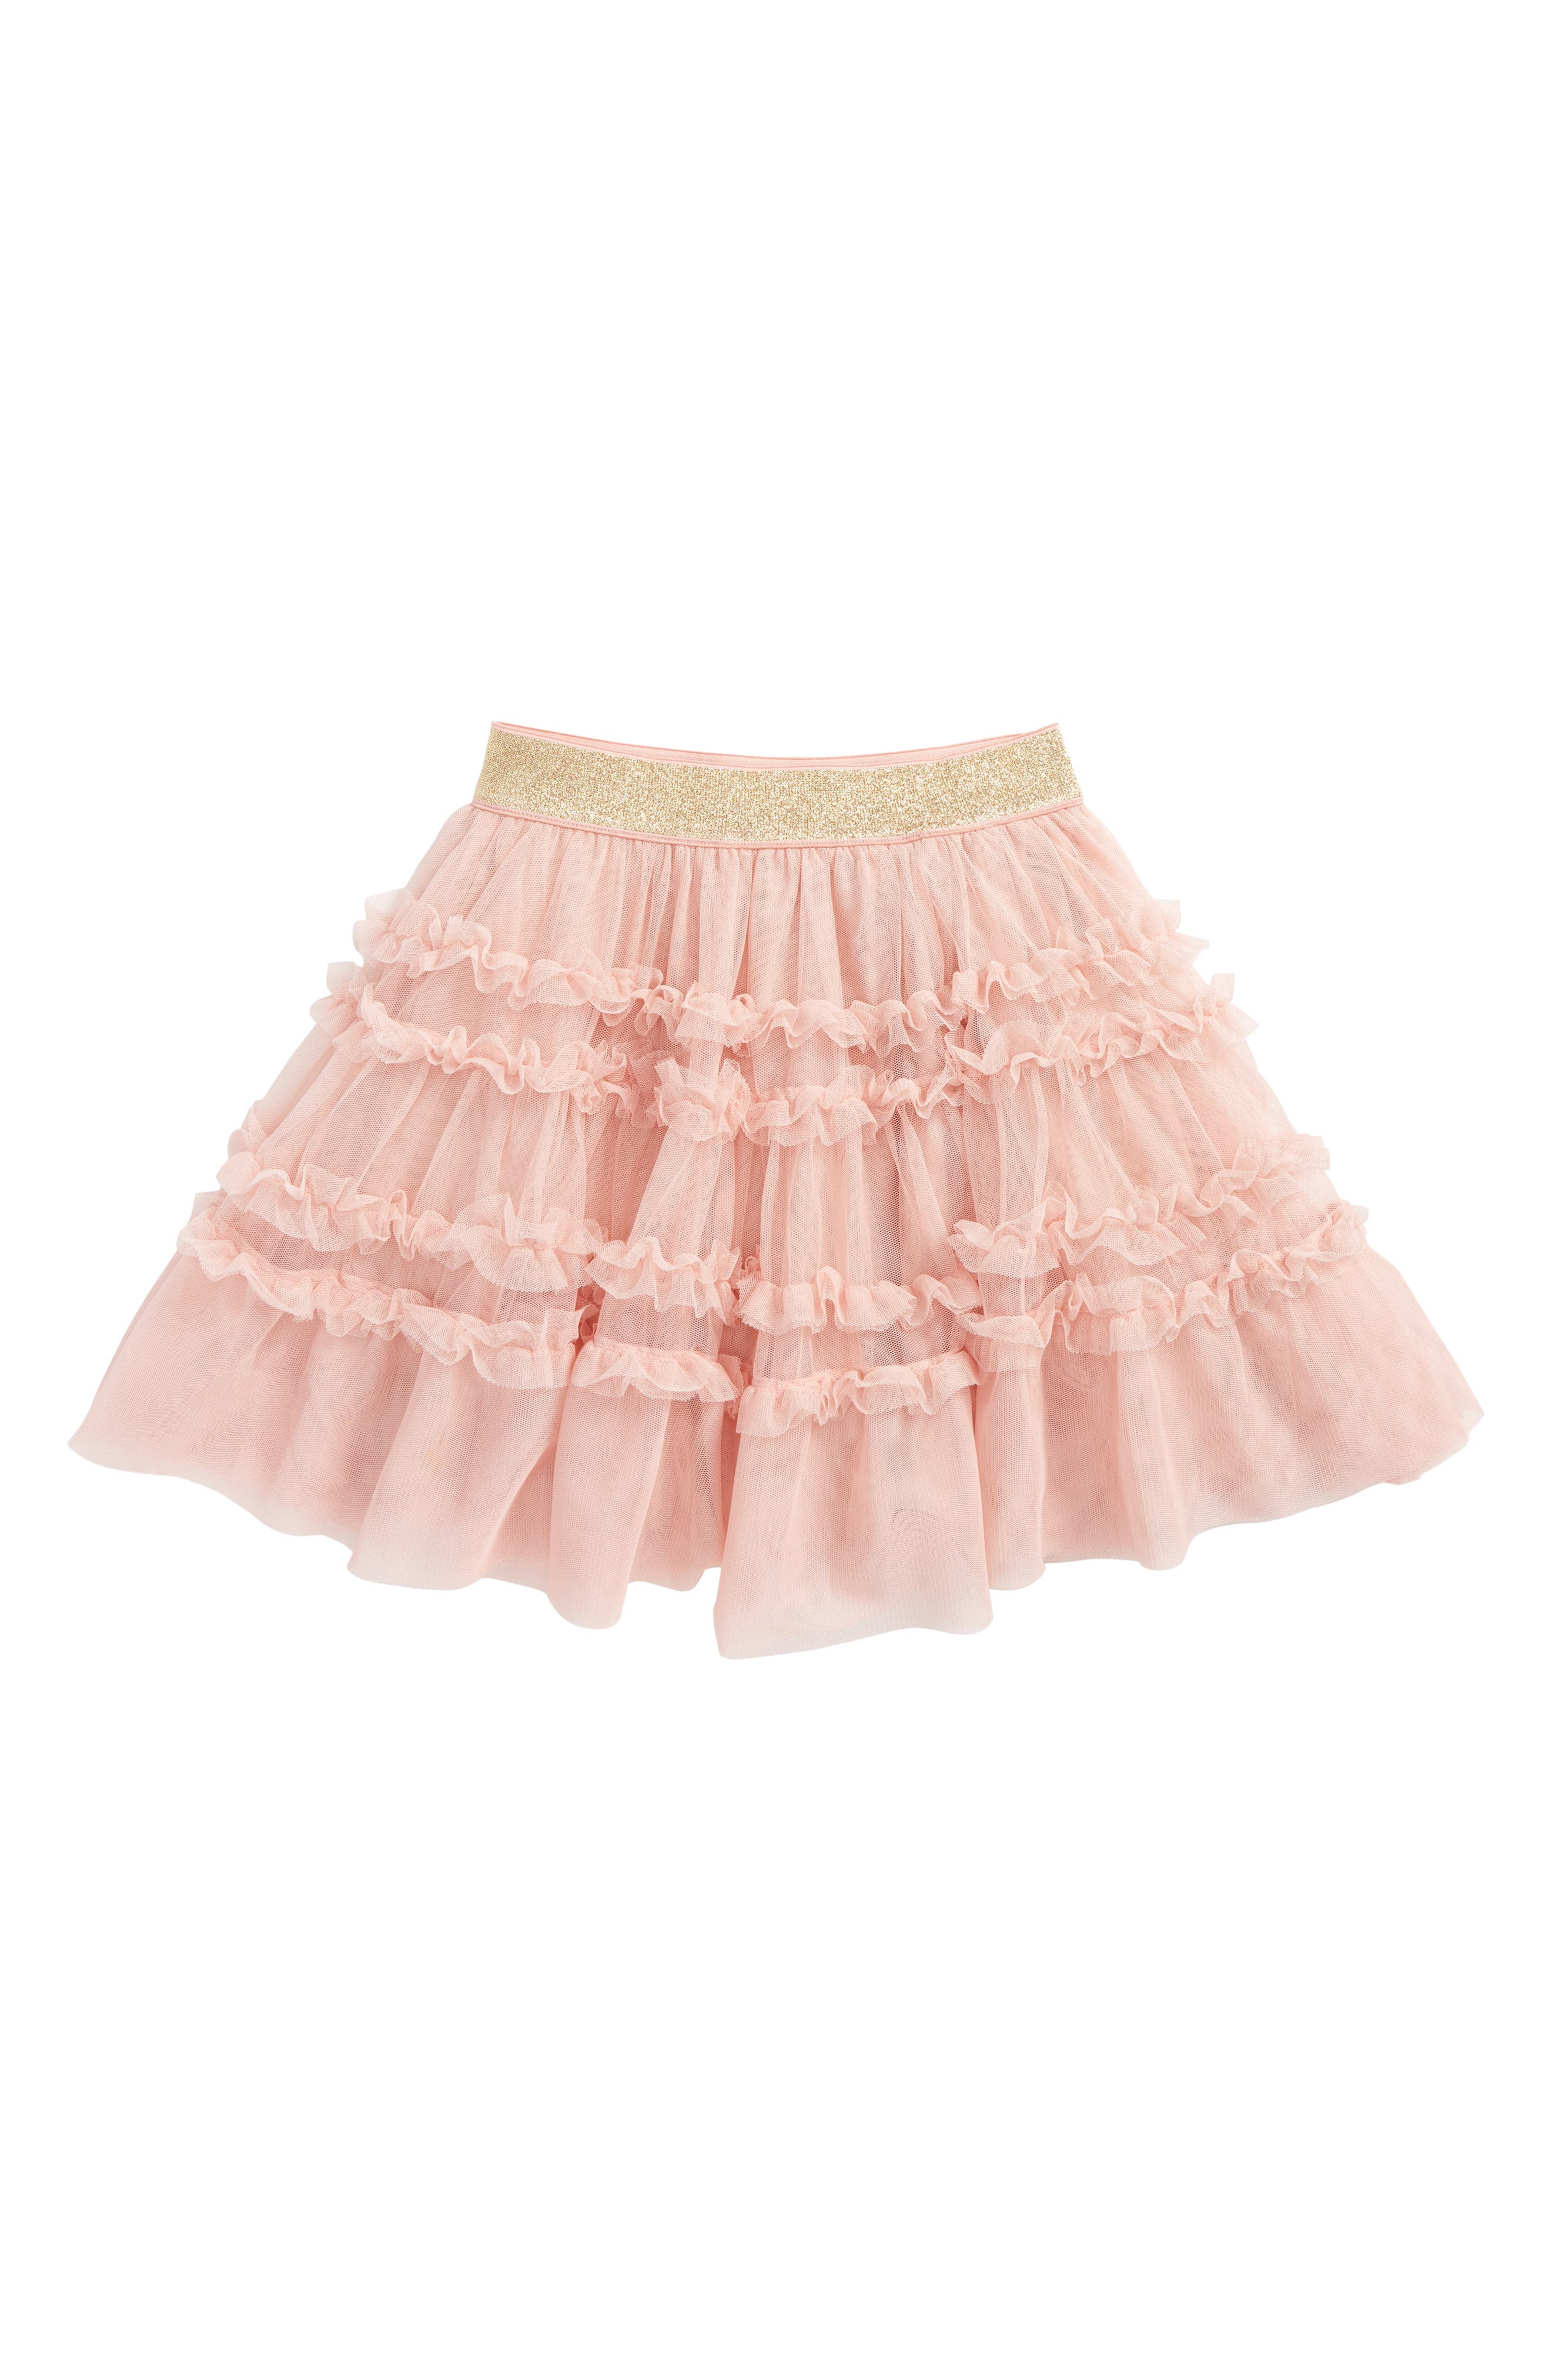 Ruffle Tulle Skirt,                             Main thumbnail 1, color,                             664